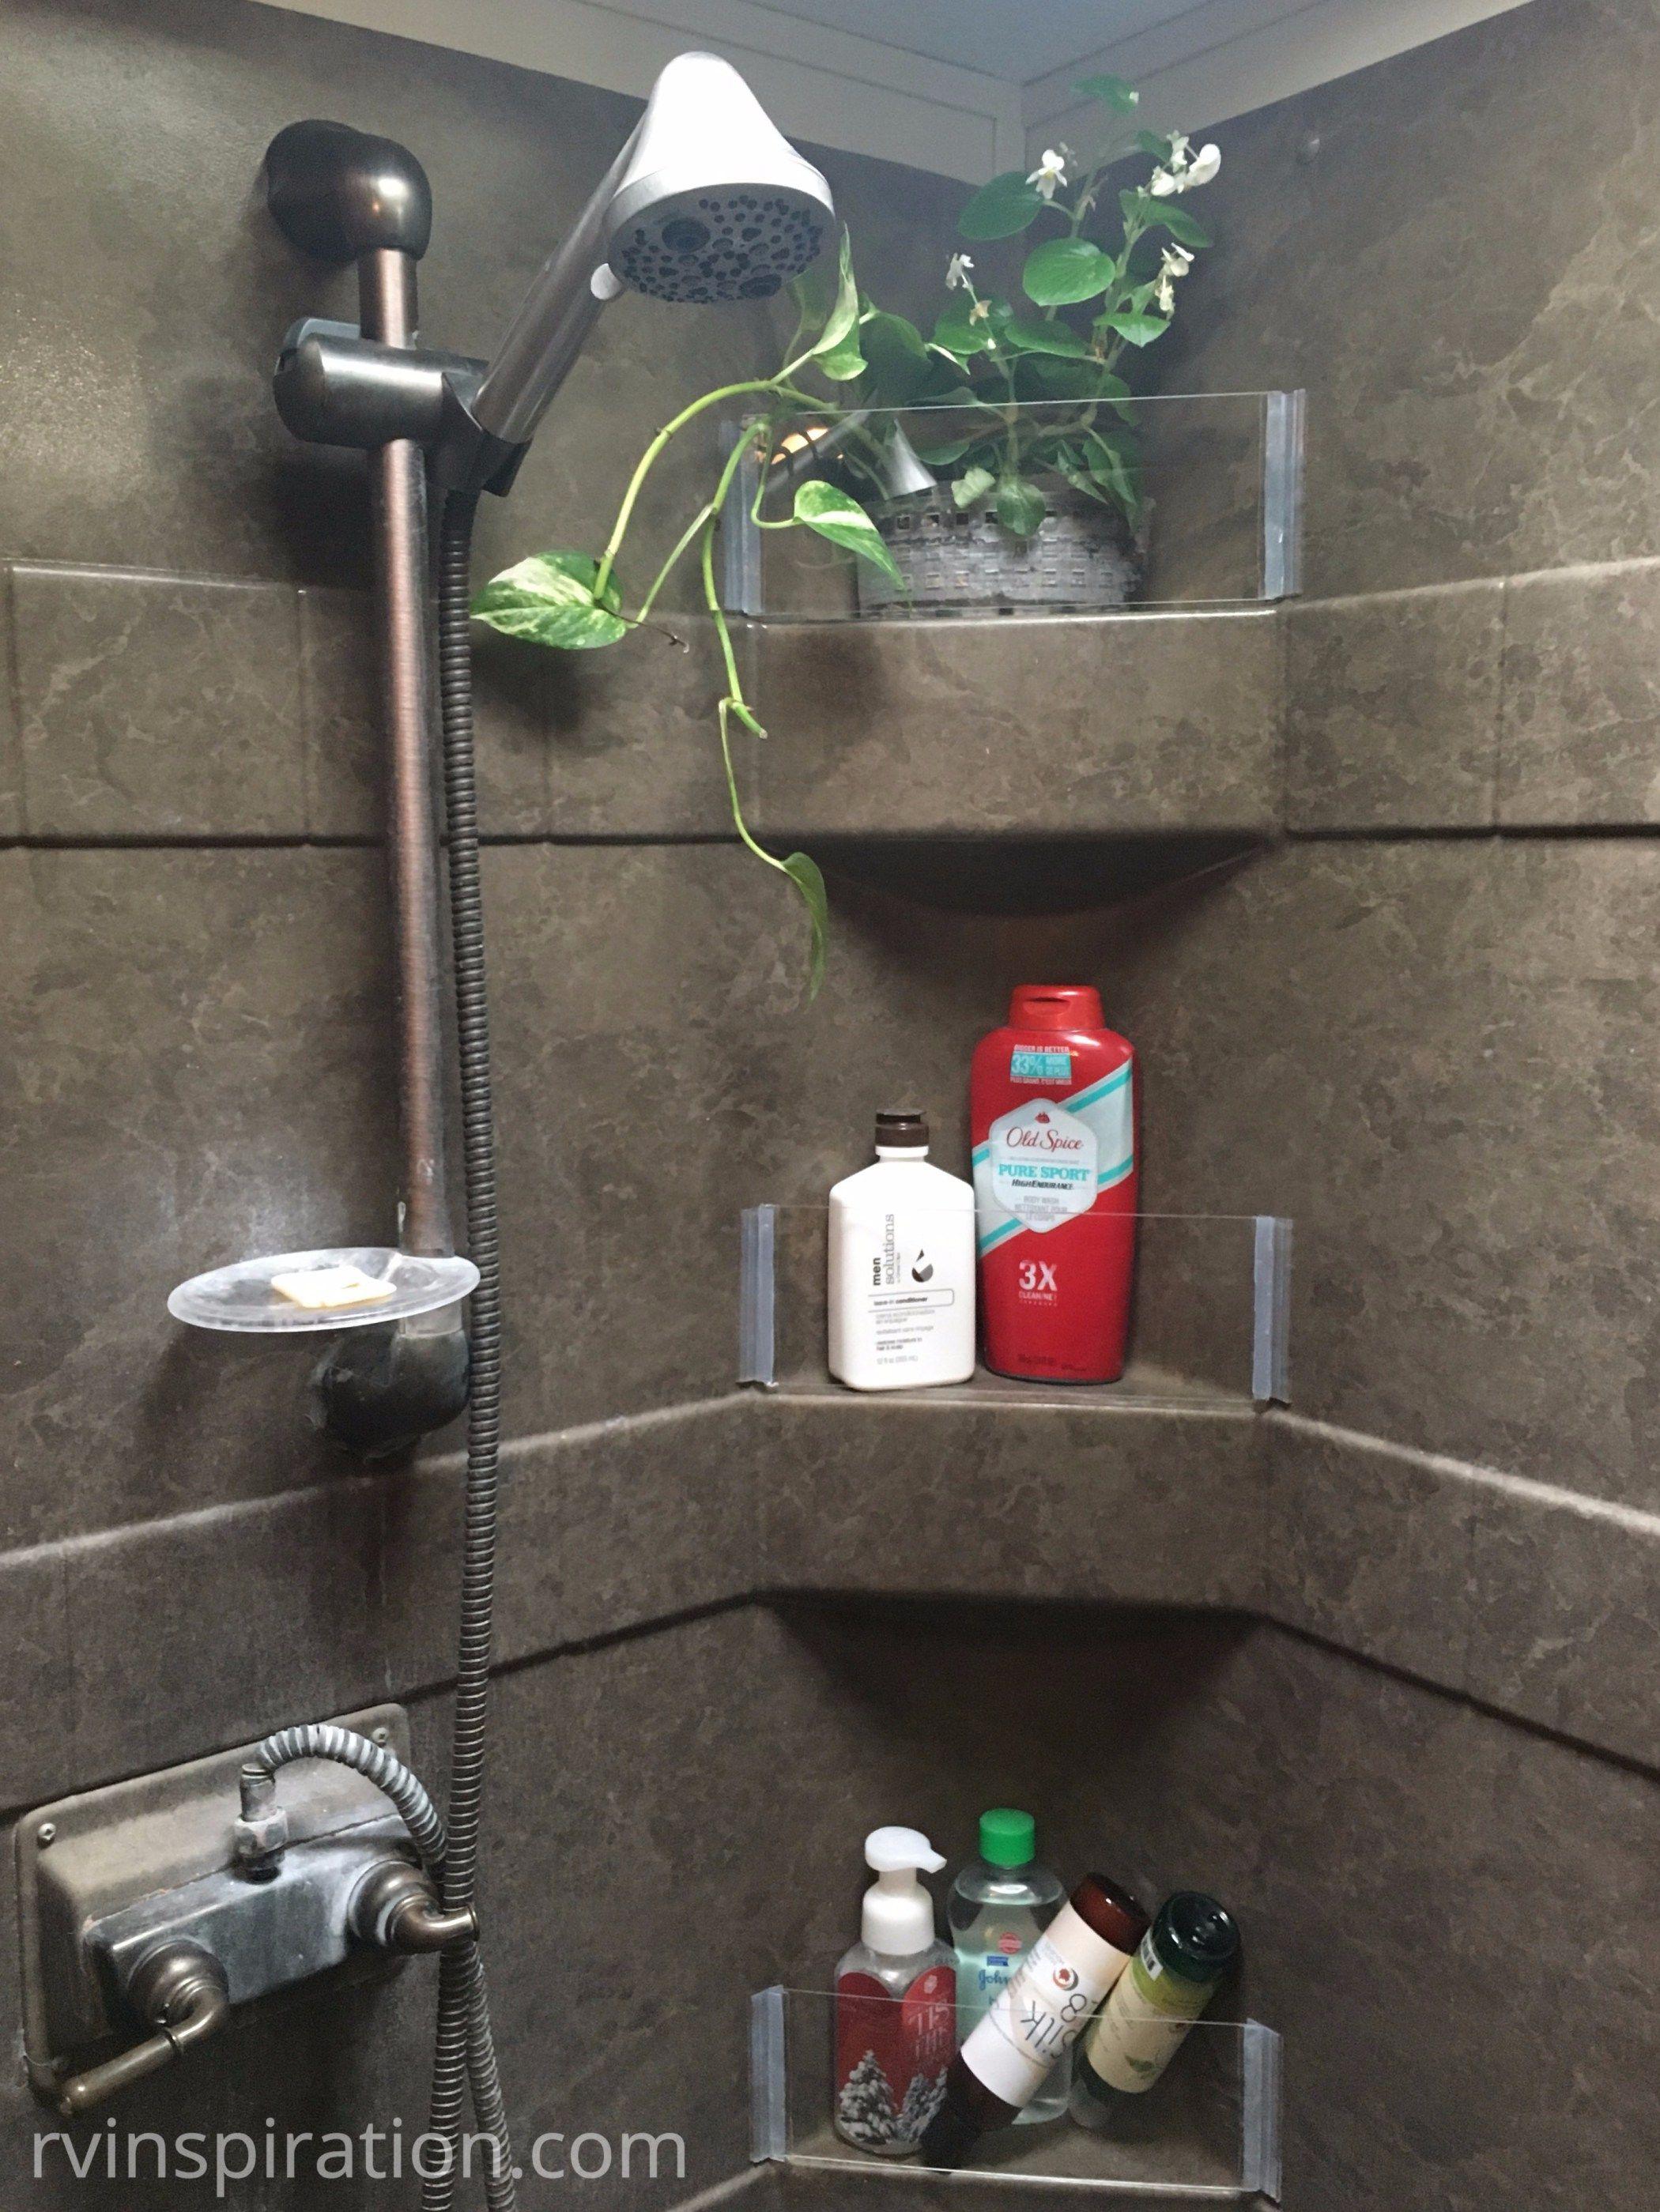 Diy How To Add Removable Walls To Shower Shelves Rv Inspiration Shower Shelves Rv Bathroom Bathroom Storage Organization